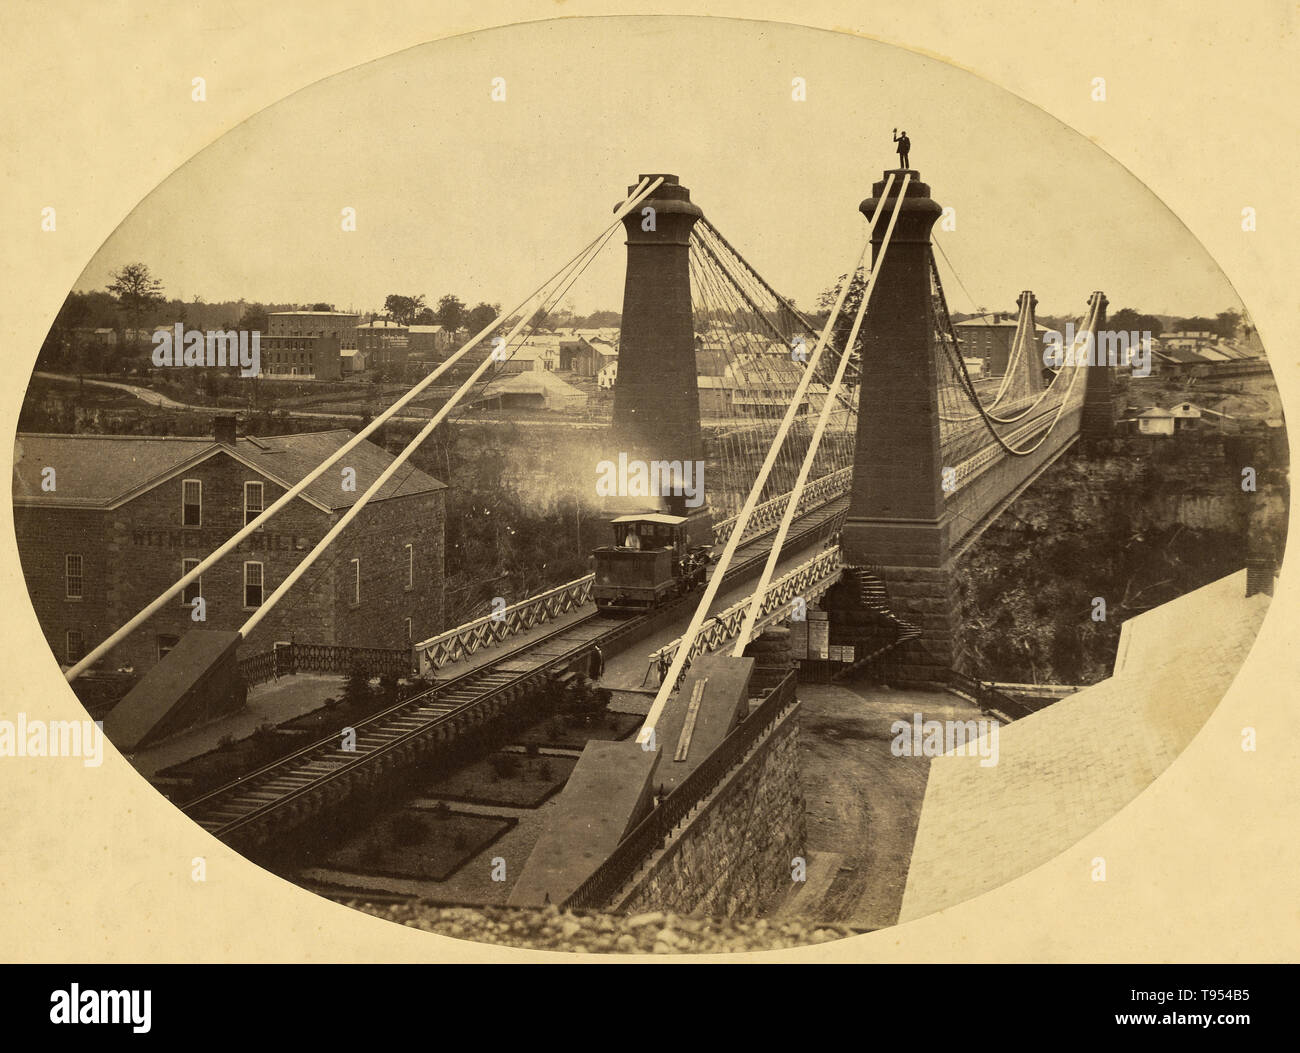 Niagara Falls suspension bridge. Silas A. Holmes (American, 1820 - 1886); Niagara Falls, Ontario, Canada; 1855 - 1860. Salted paper print. - Stock Image